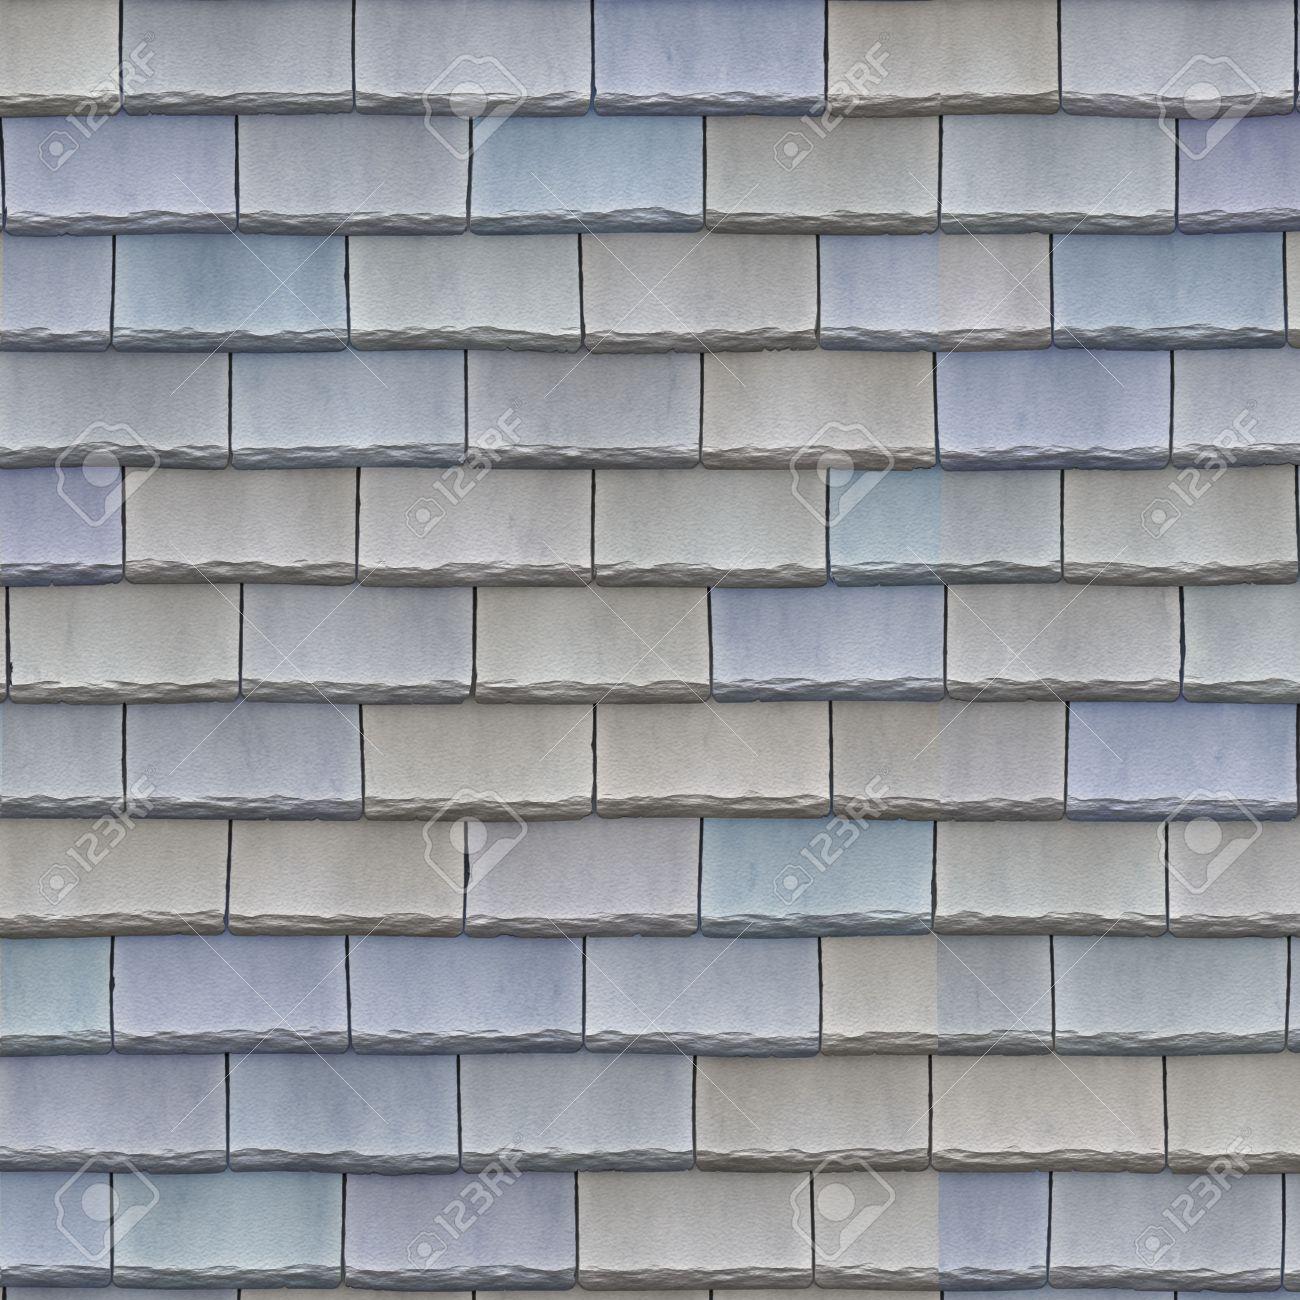 Dachziegel textur grau  Dach Textur Lizenzfreie Vektorgrafiken Kaufen: 123RF